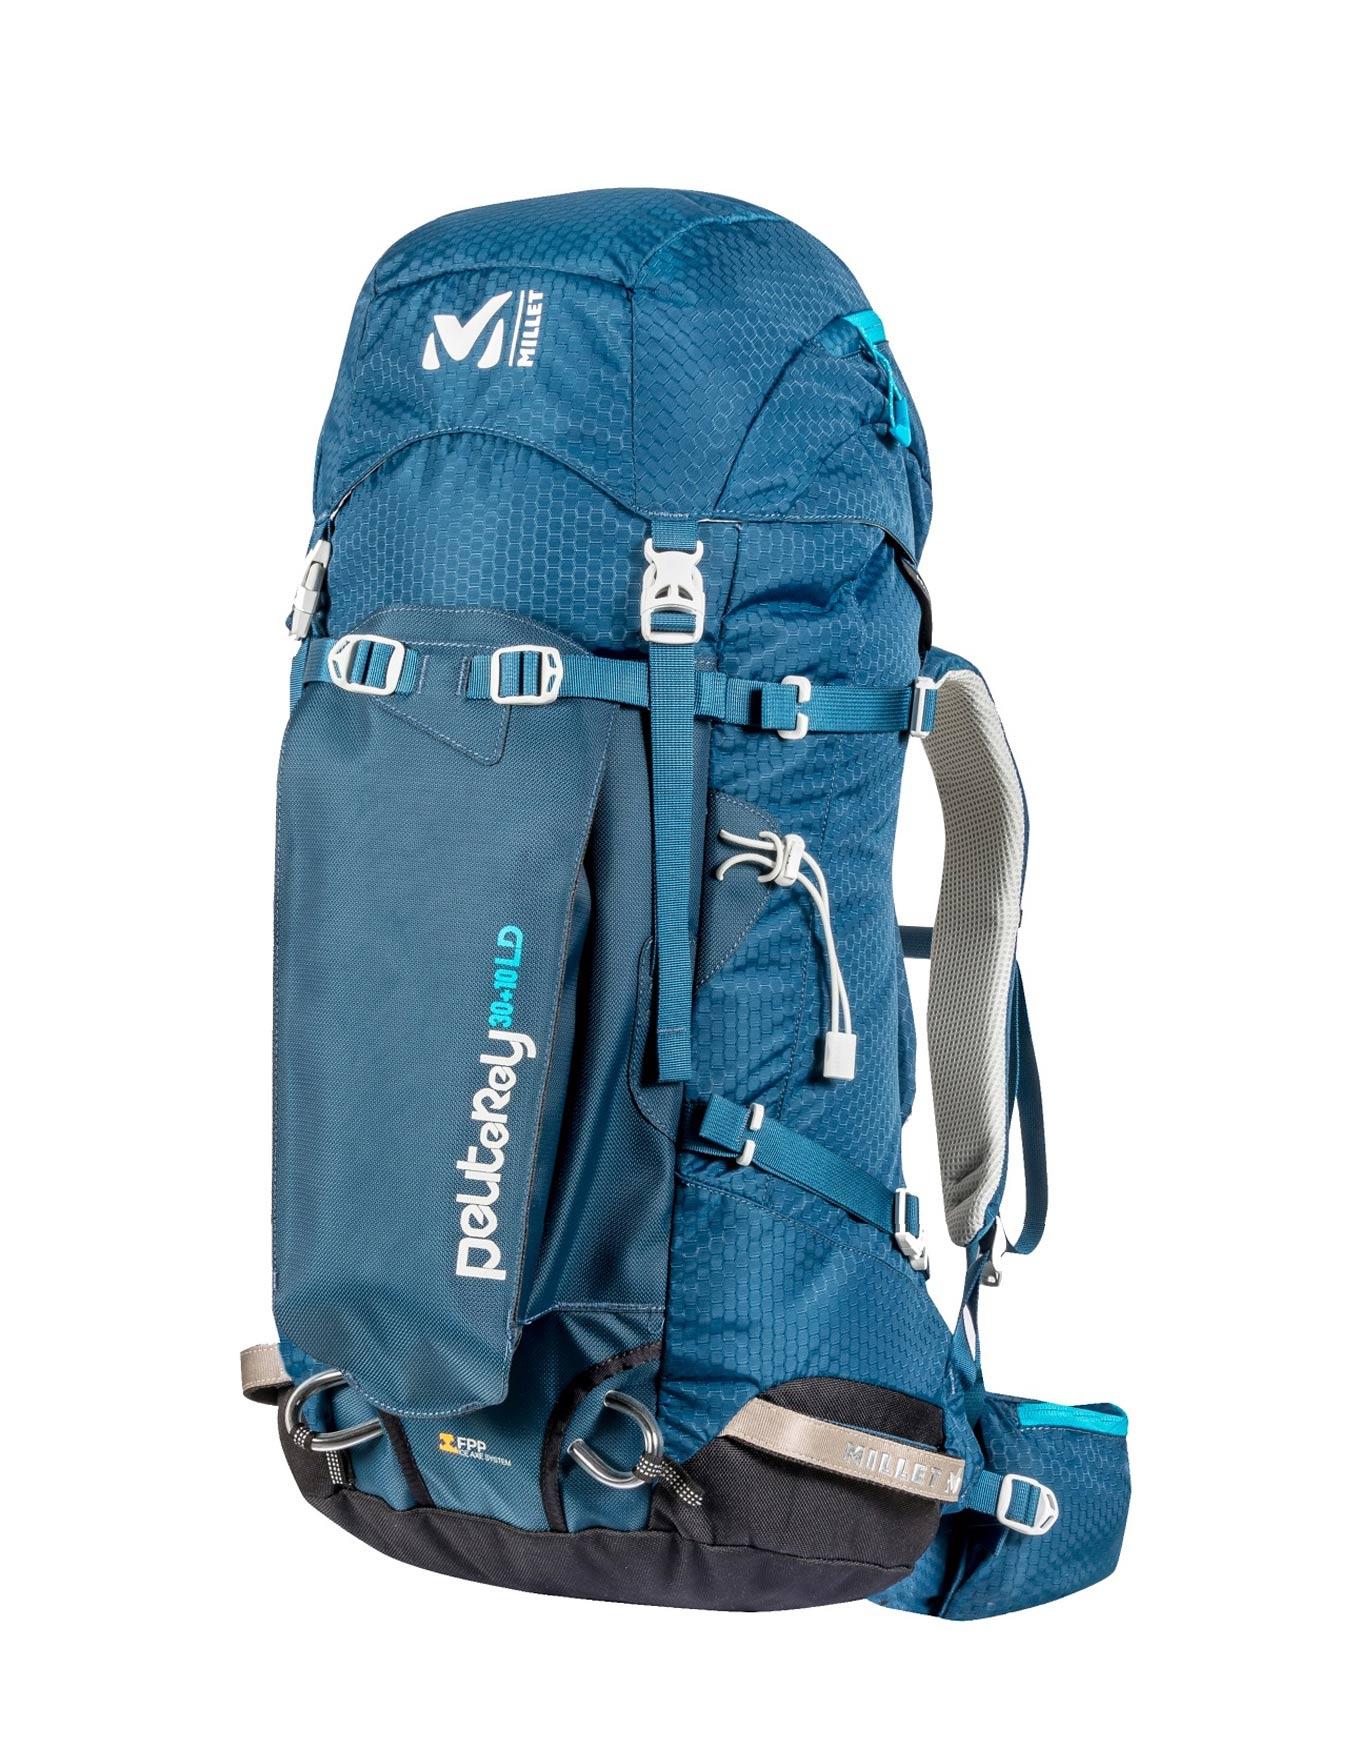 92db604cefbb Peuterey 30+10 LD Majolica blue Millet   Sacs à dos alpinisme ...